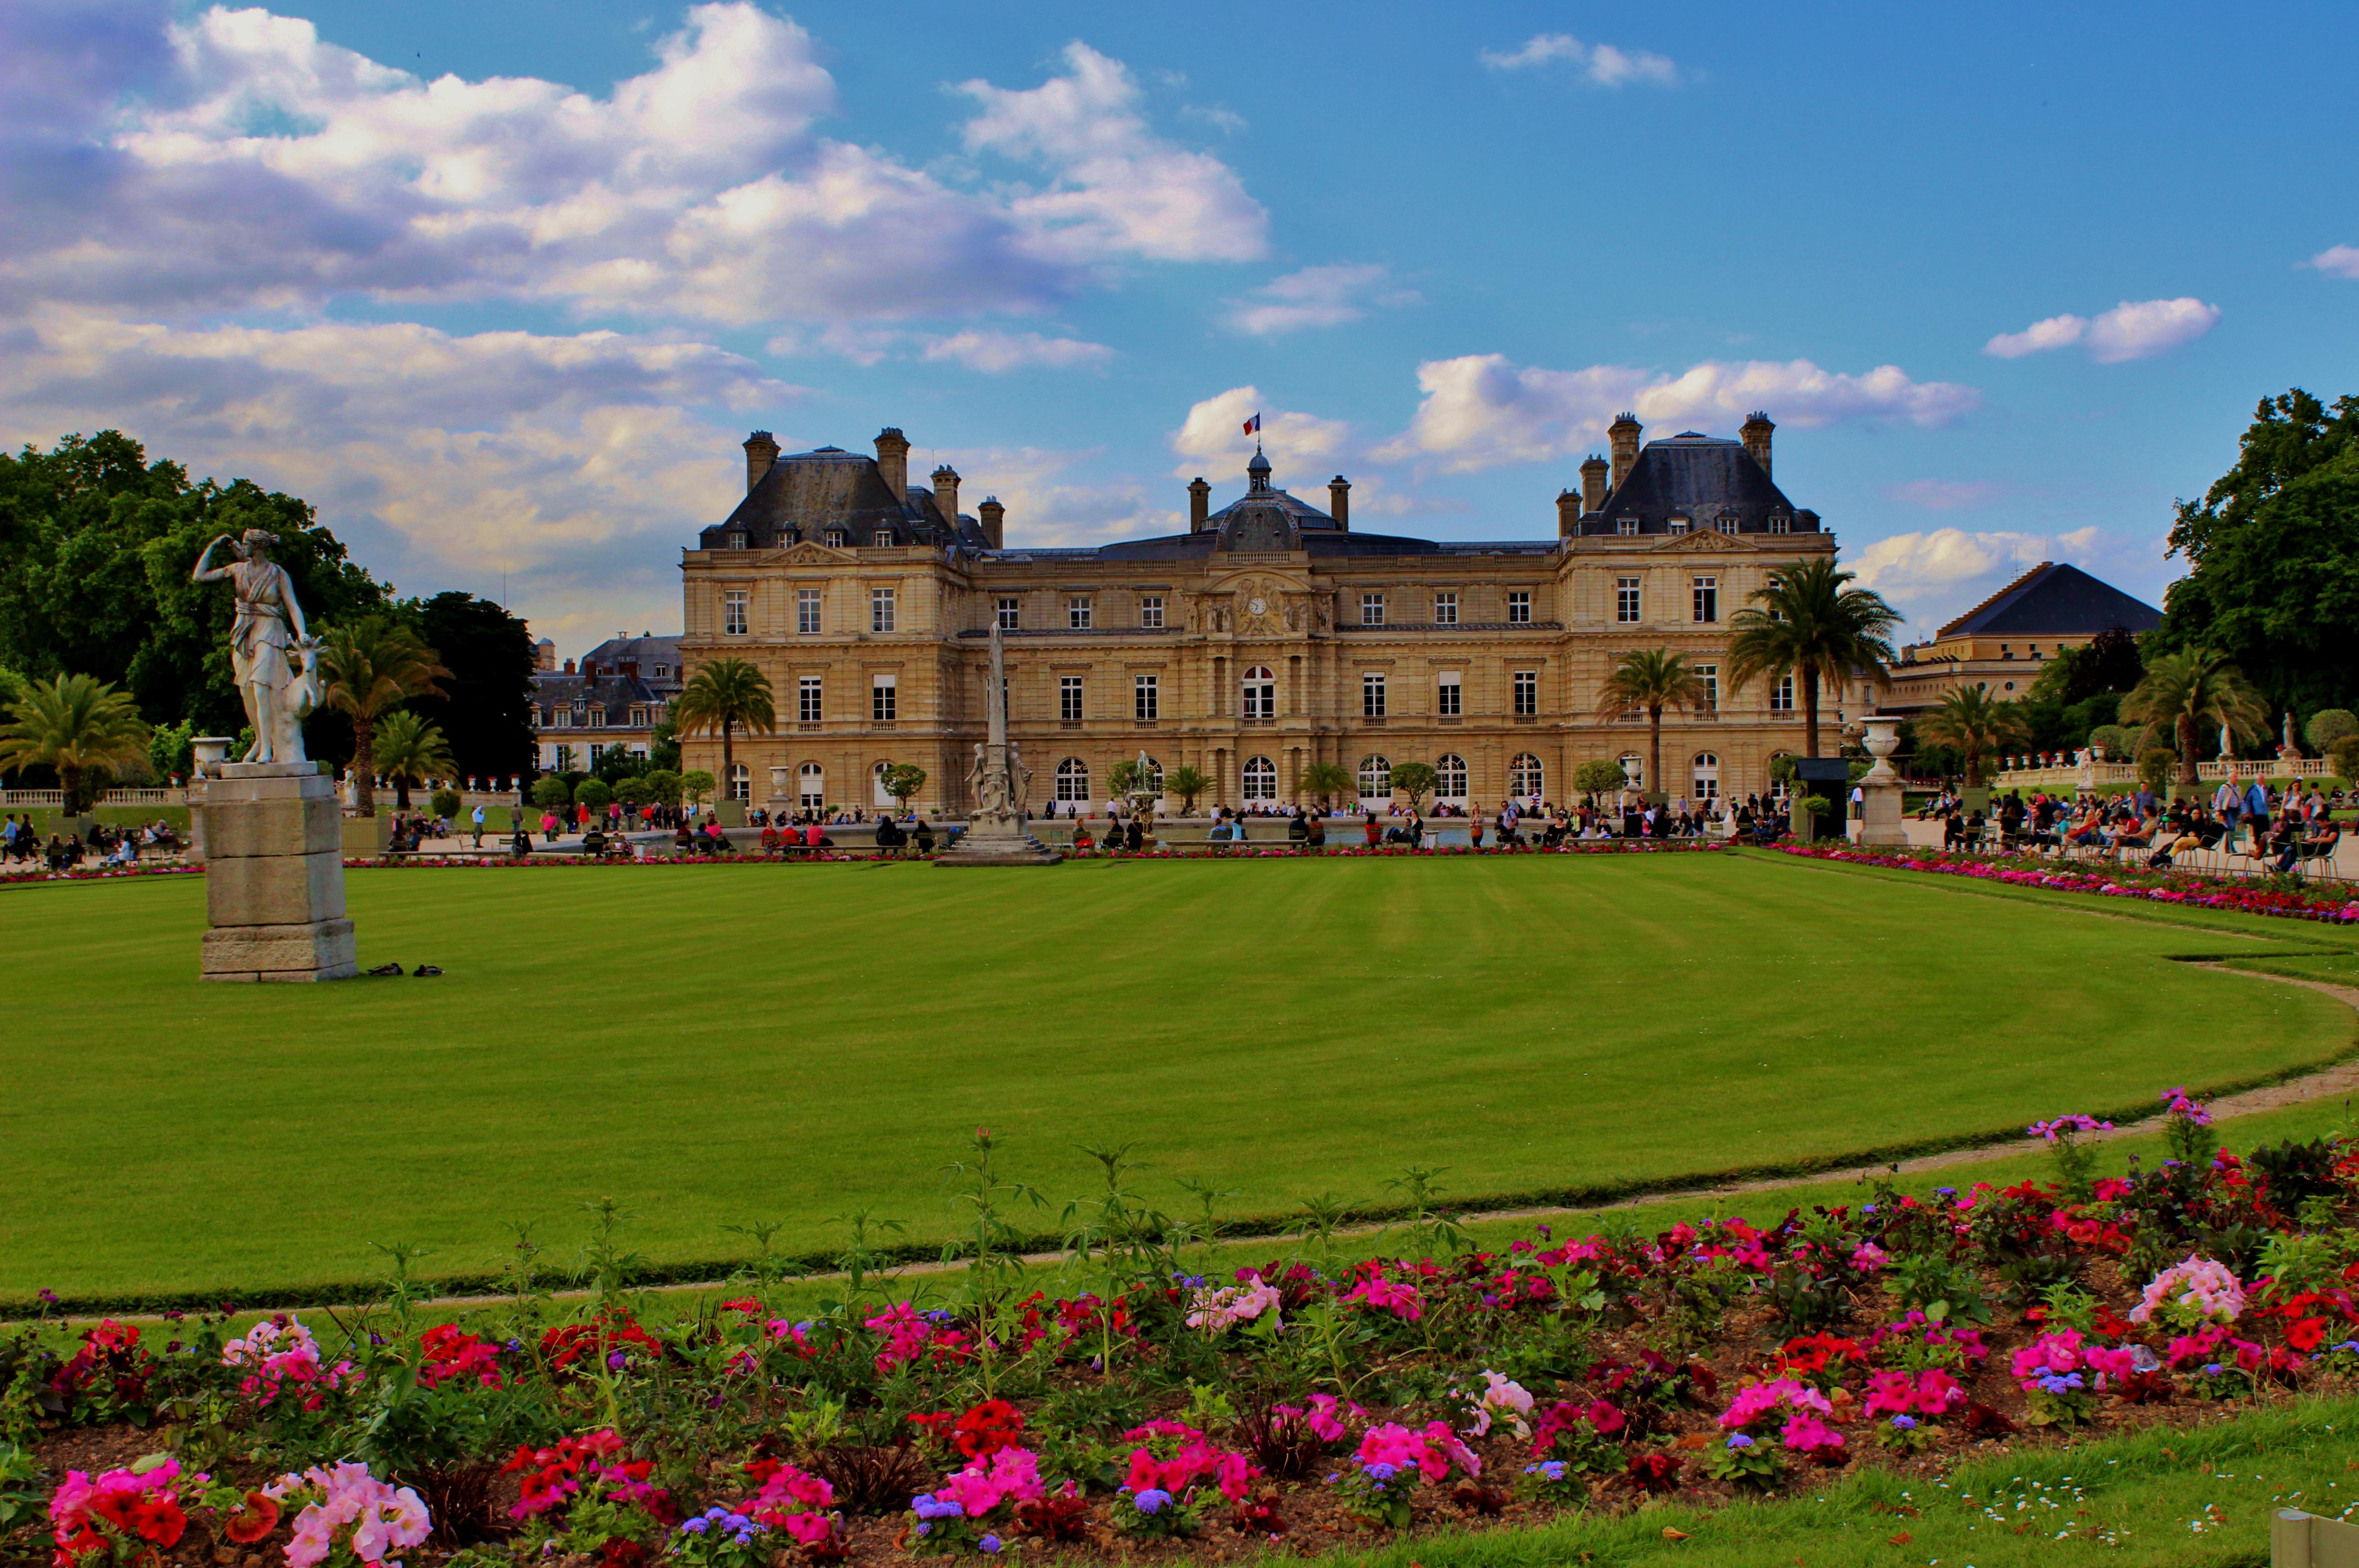 File:Le Jardin du Luxembourg, Paris, France - panoramio (10).jpg - Wikimedia Commons